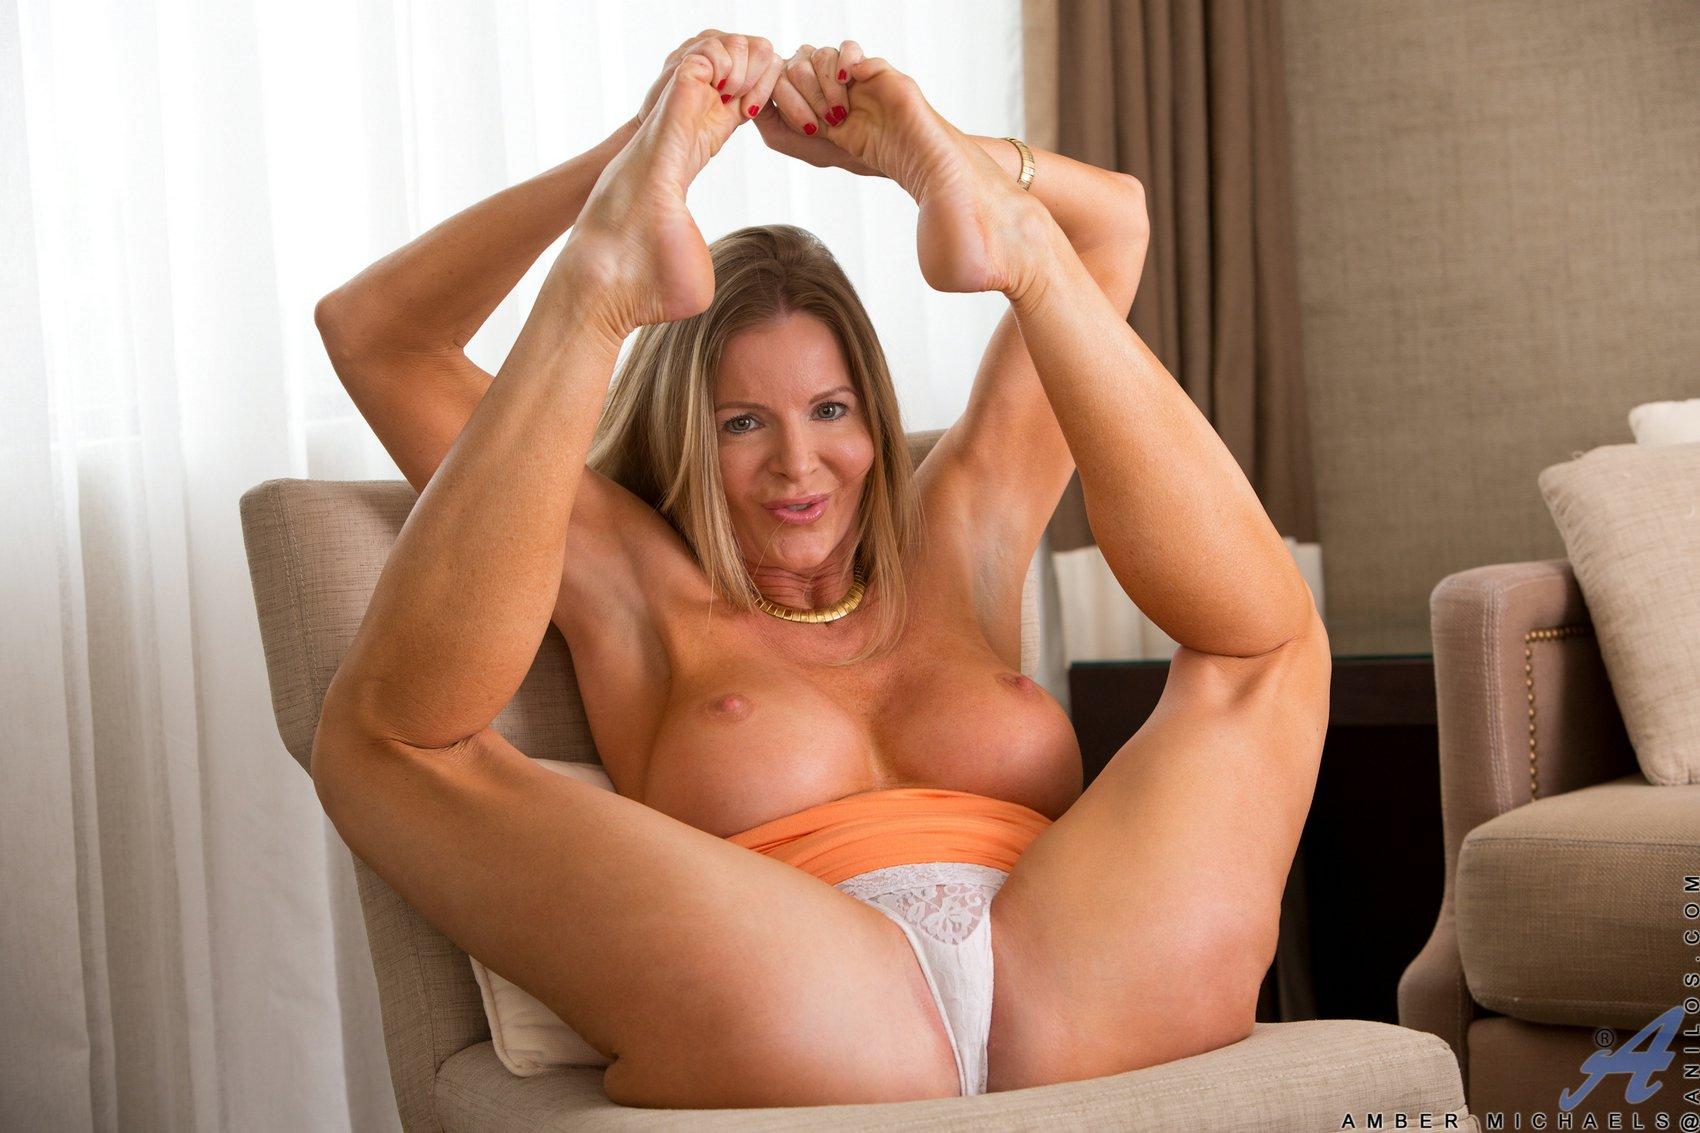 Amber michaels porn star